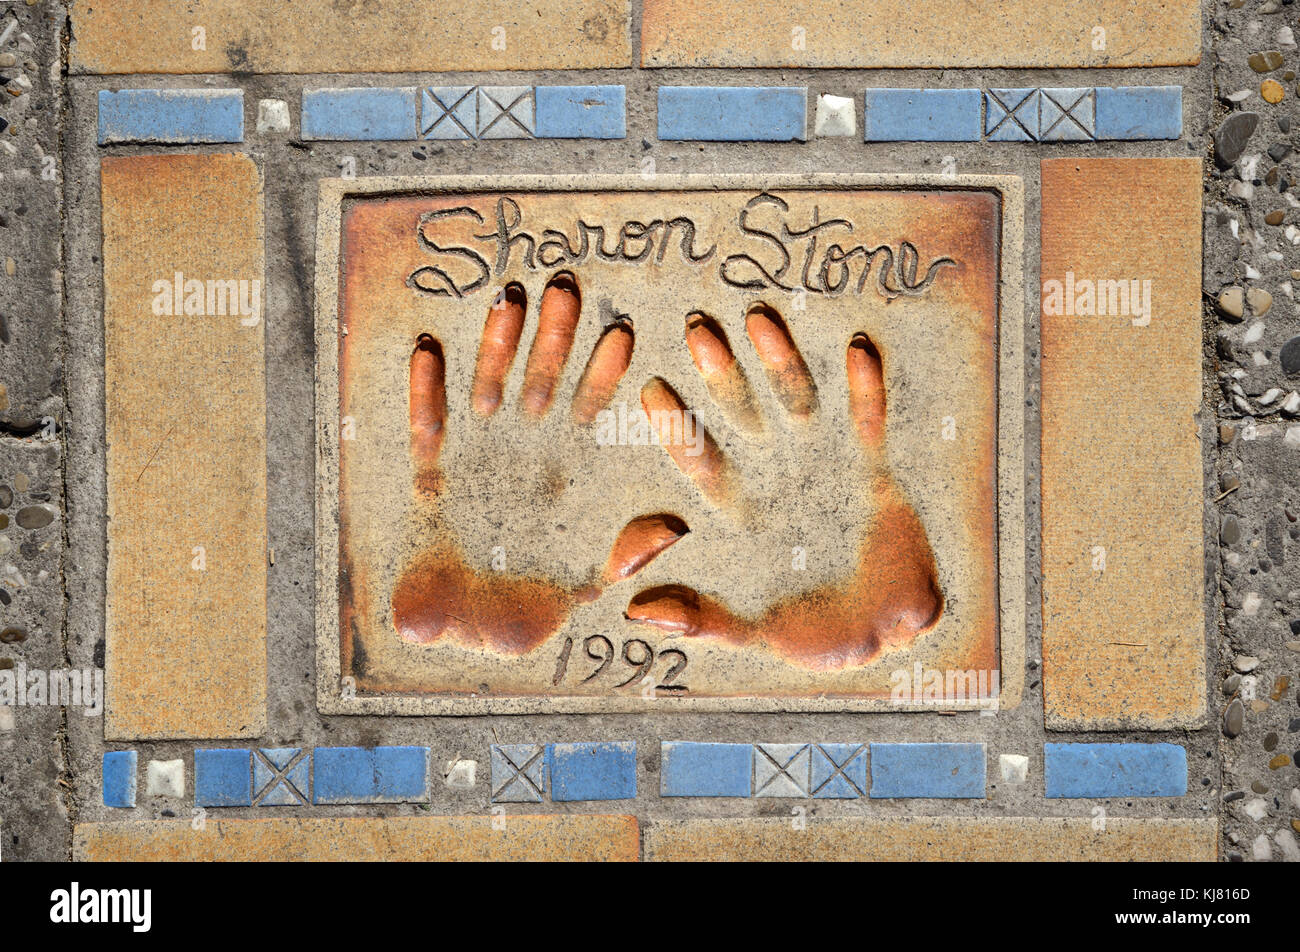 Sharon Stone Handprints on the Avenue of Stars Pavement or Sidewalk, Boulevard de la Croisette Seafront, Cannes, - Stock Image